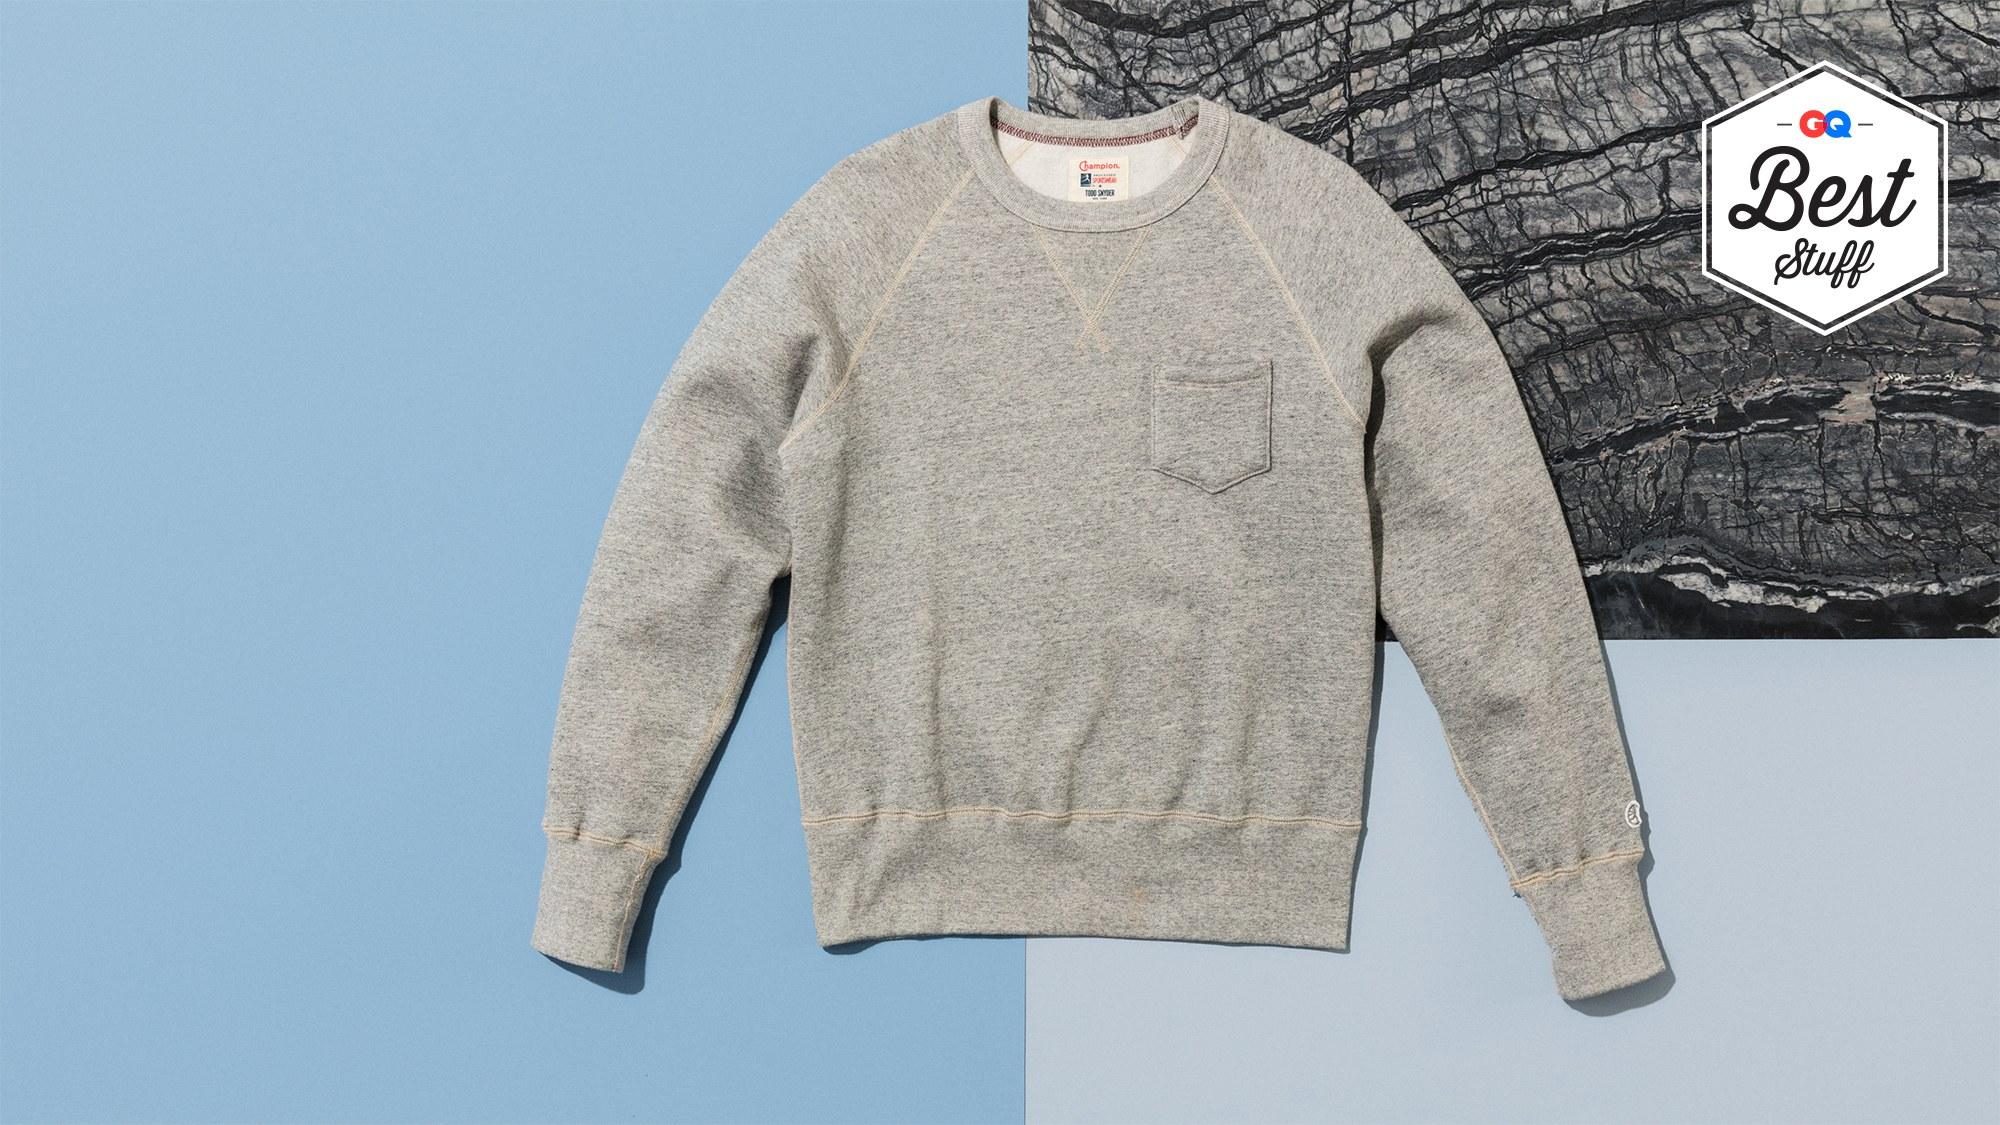 The Crewneck Sweatshirt Really Is a Wardrobe Essential